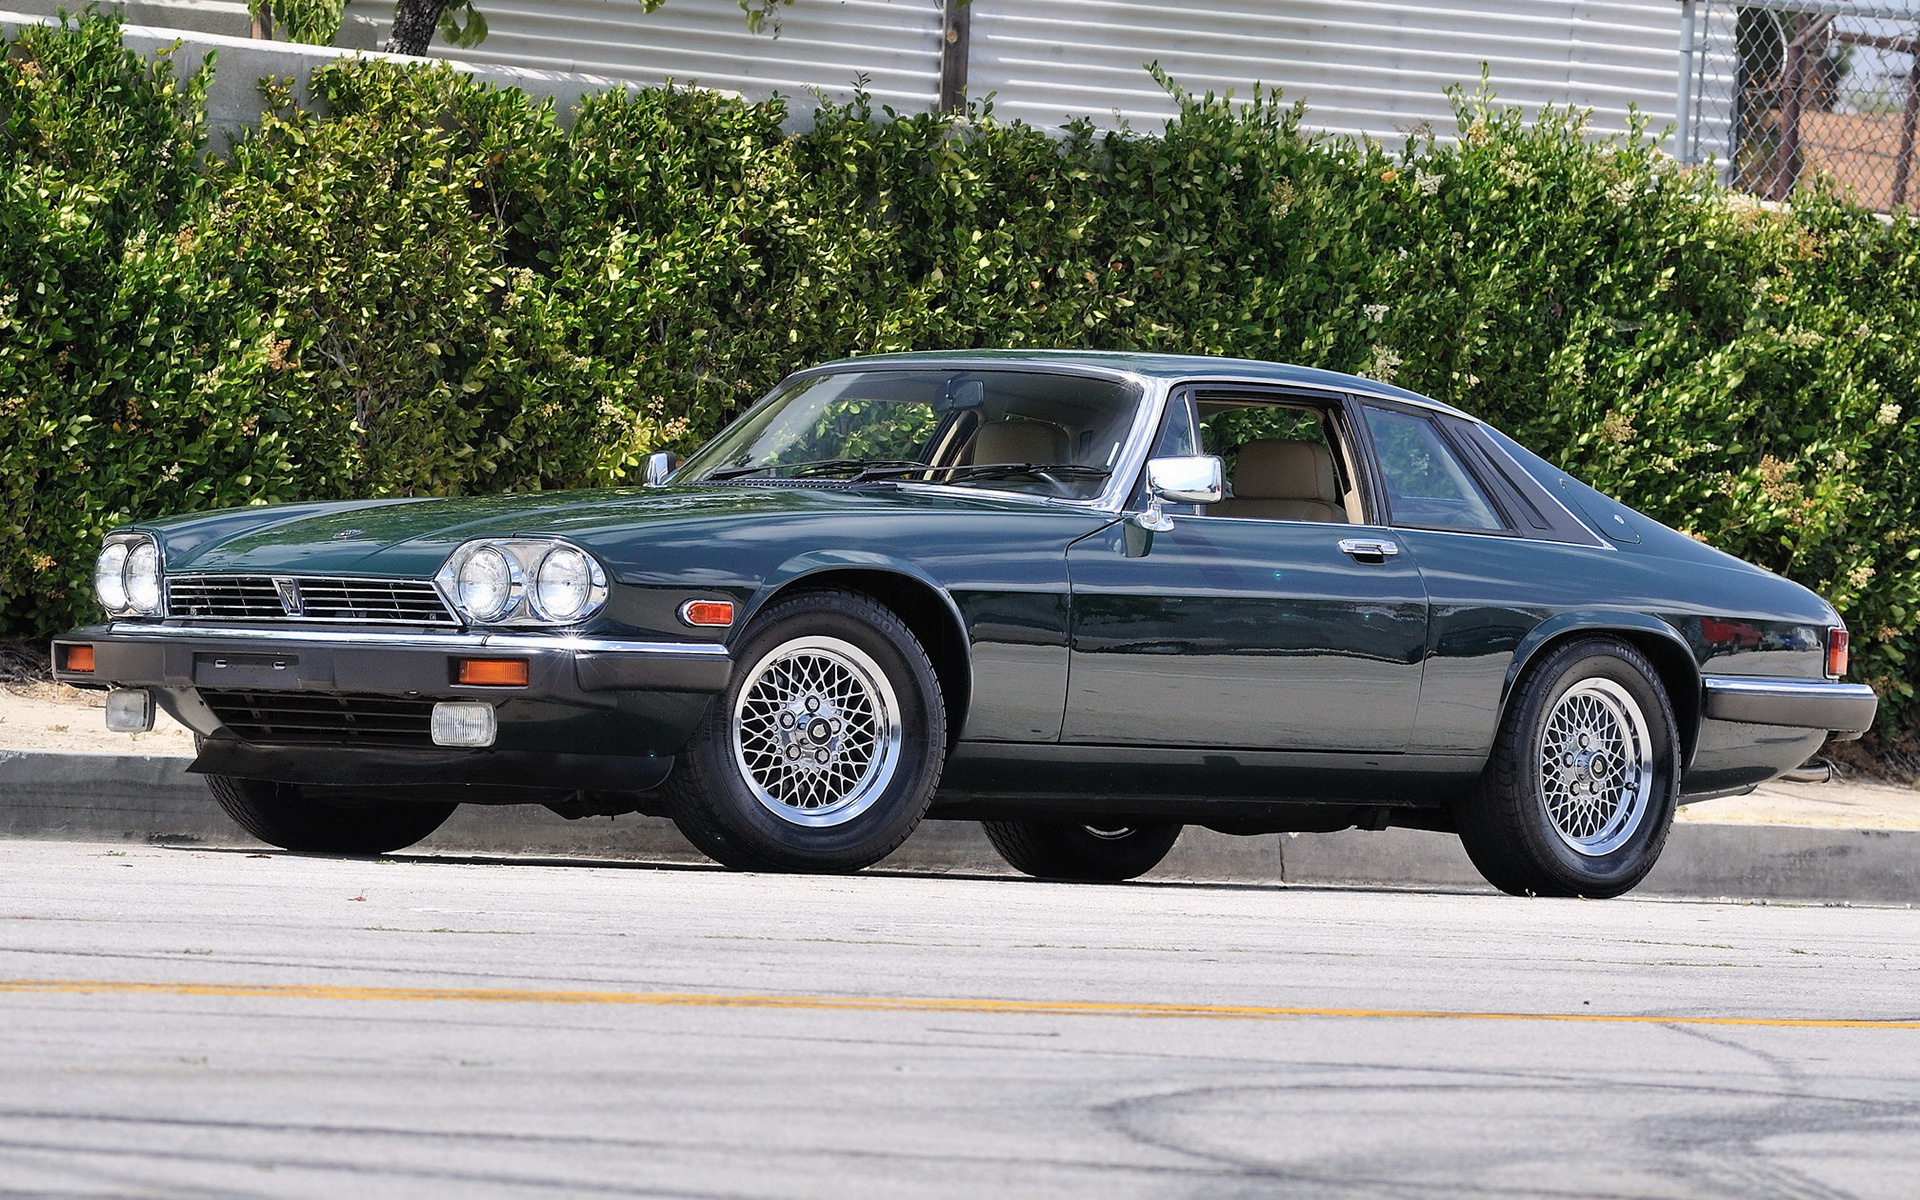 1976 Jaguar XJ-S (US) - Wallpapers and HD Images   Car Pixel